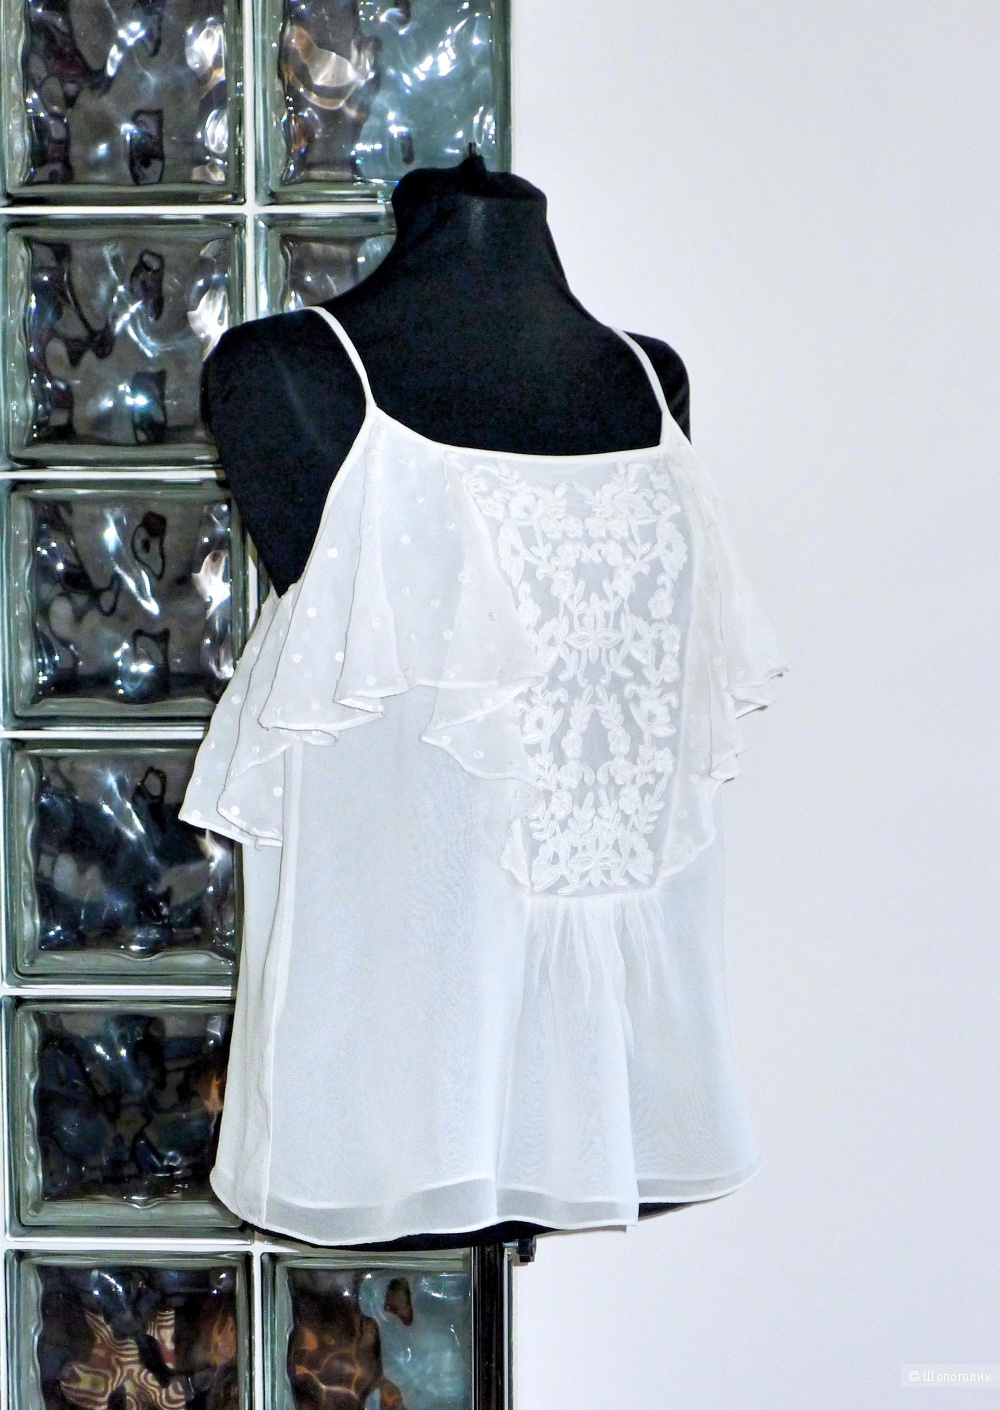 Блузка топ ZARA WOMEN размер S